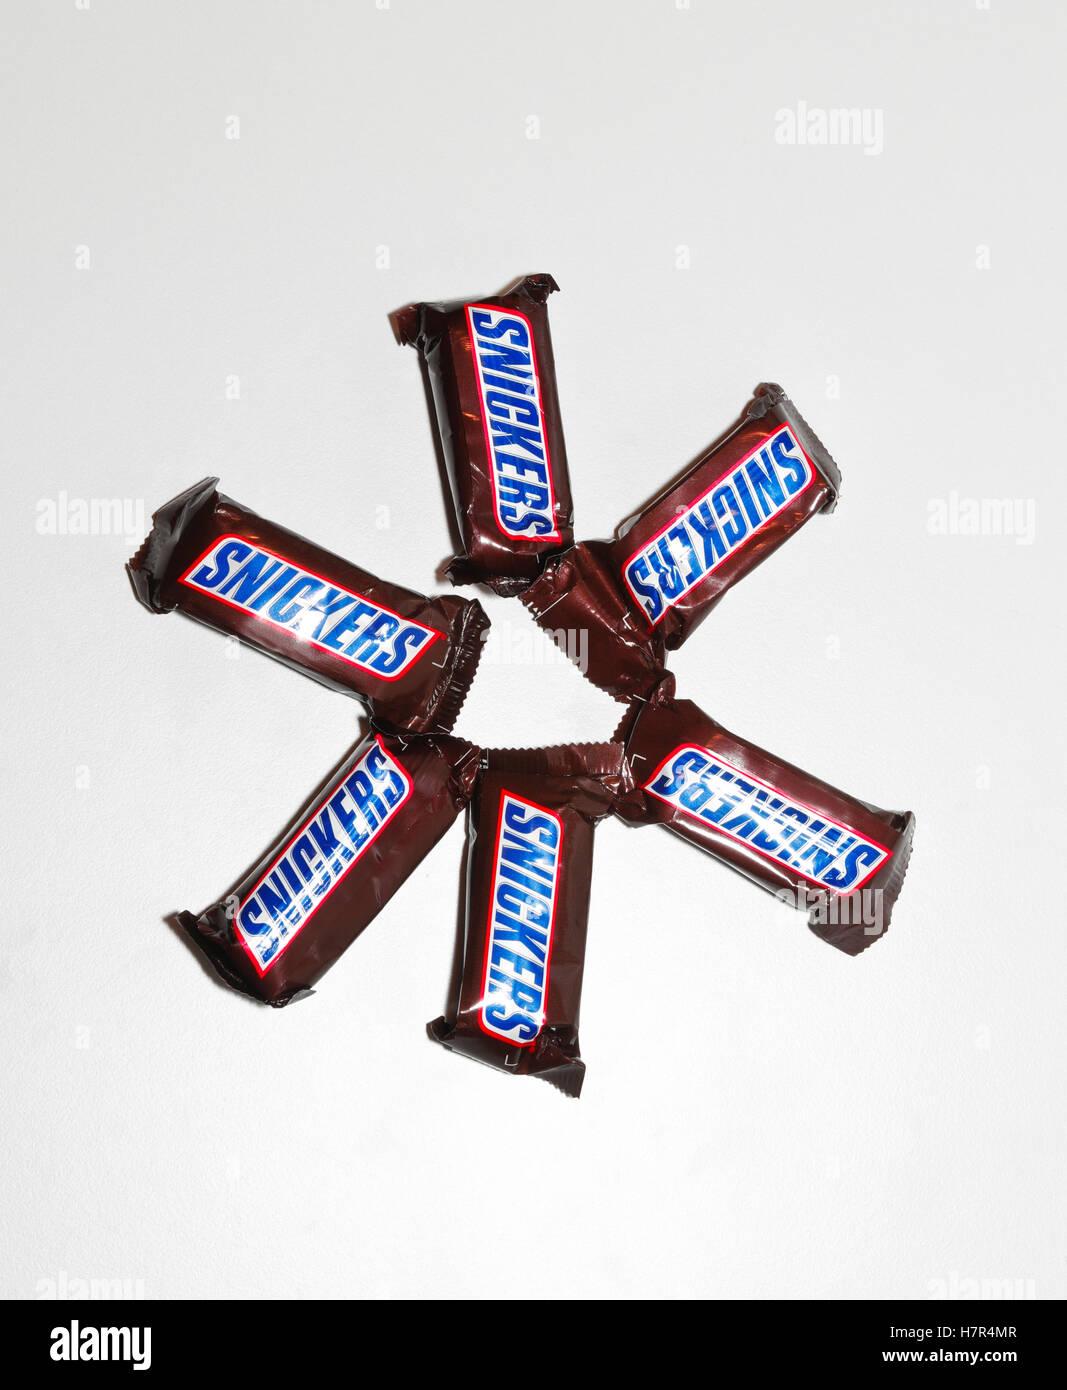 Seis mini barras de chocolate Snickers aislado sobre fondo blanco. Imagen De Stock